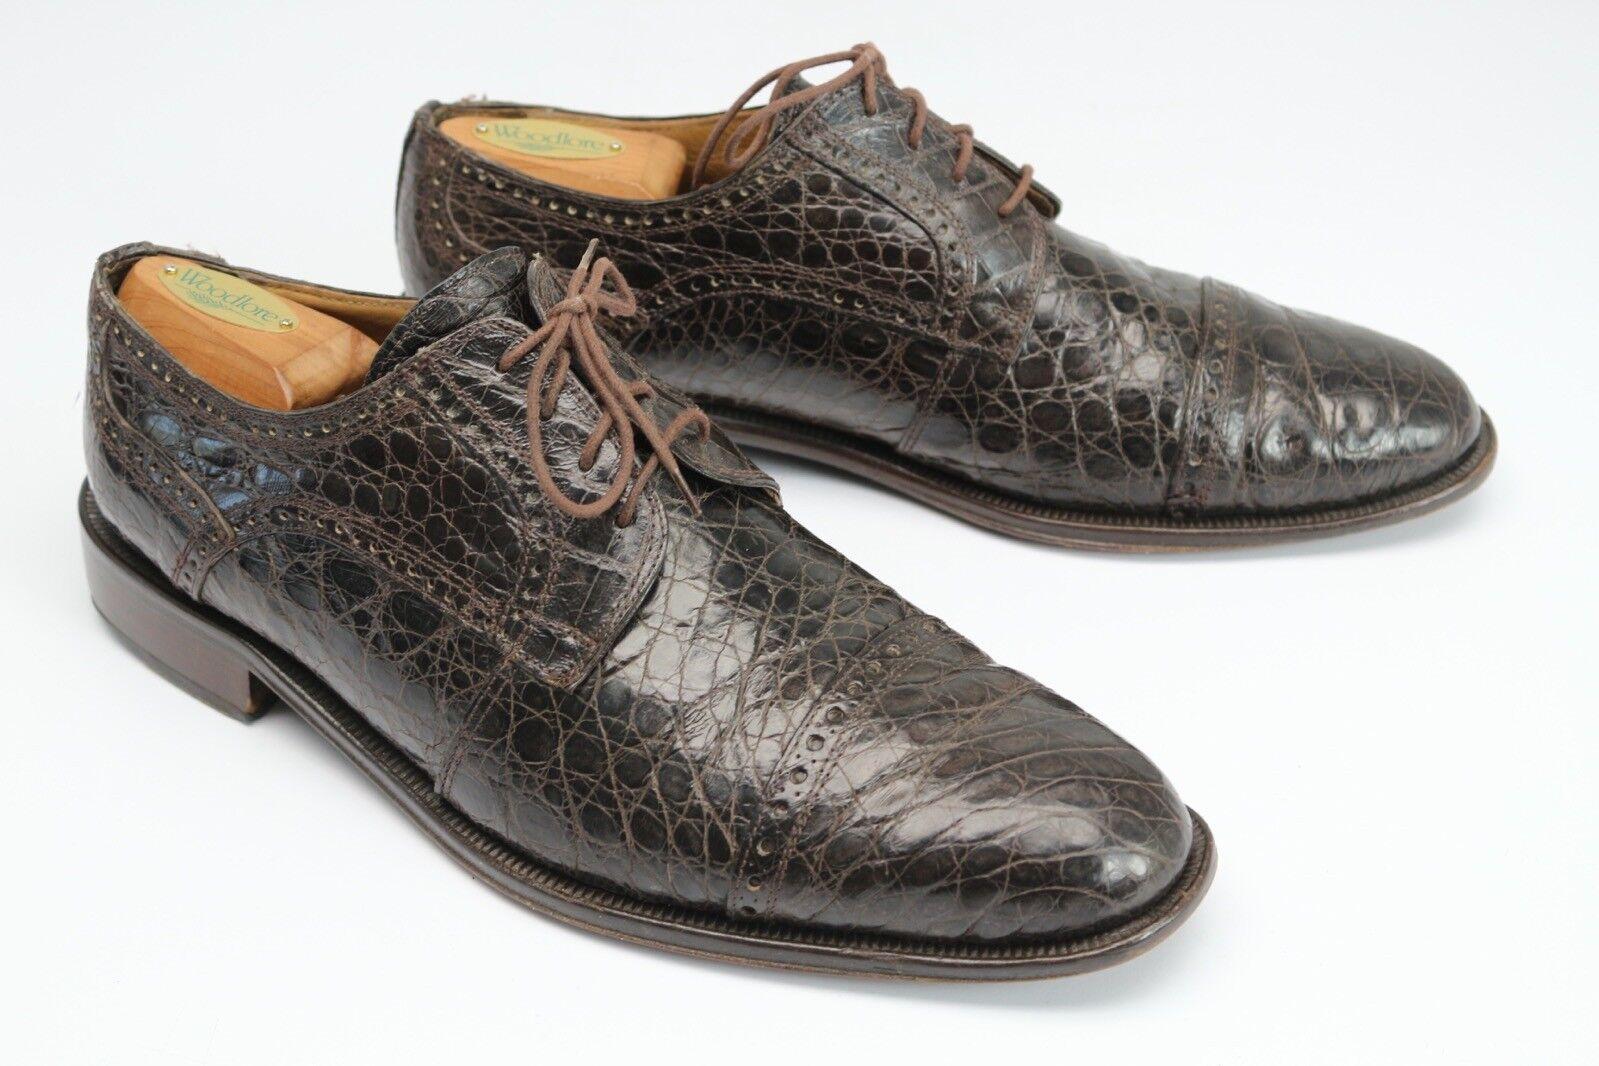 David Eden Brush Genuine Crocodile Cap Toe Dress shoes 10.5 Brown Semi Brogue